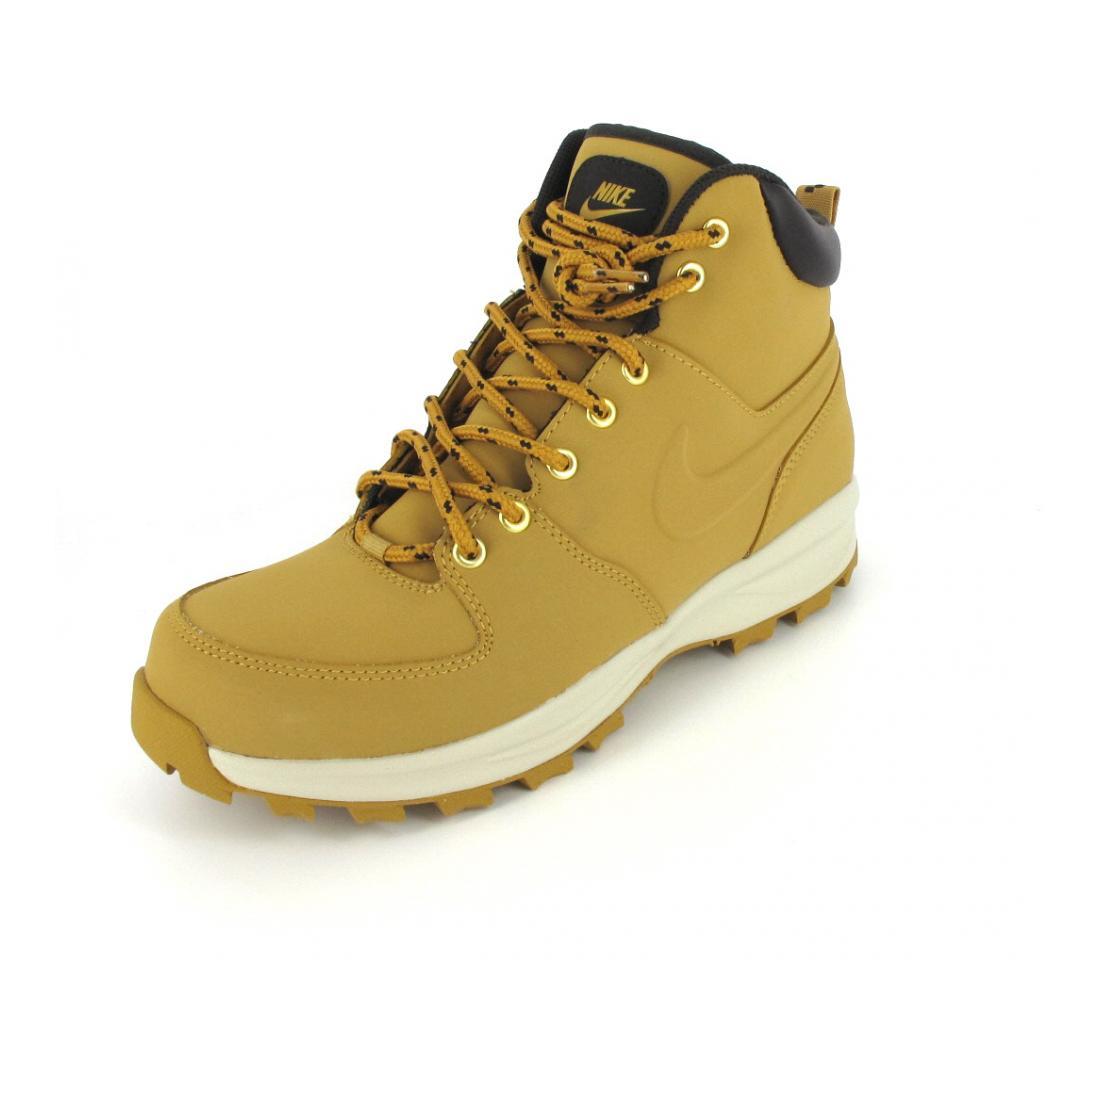 Nike Stiefel Manoa Leather